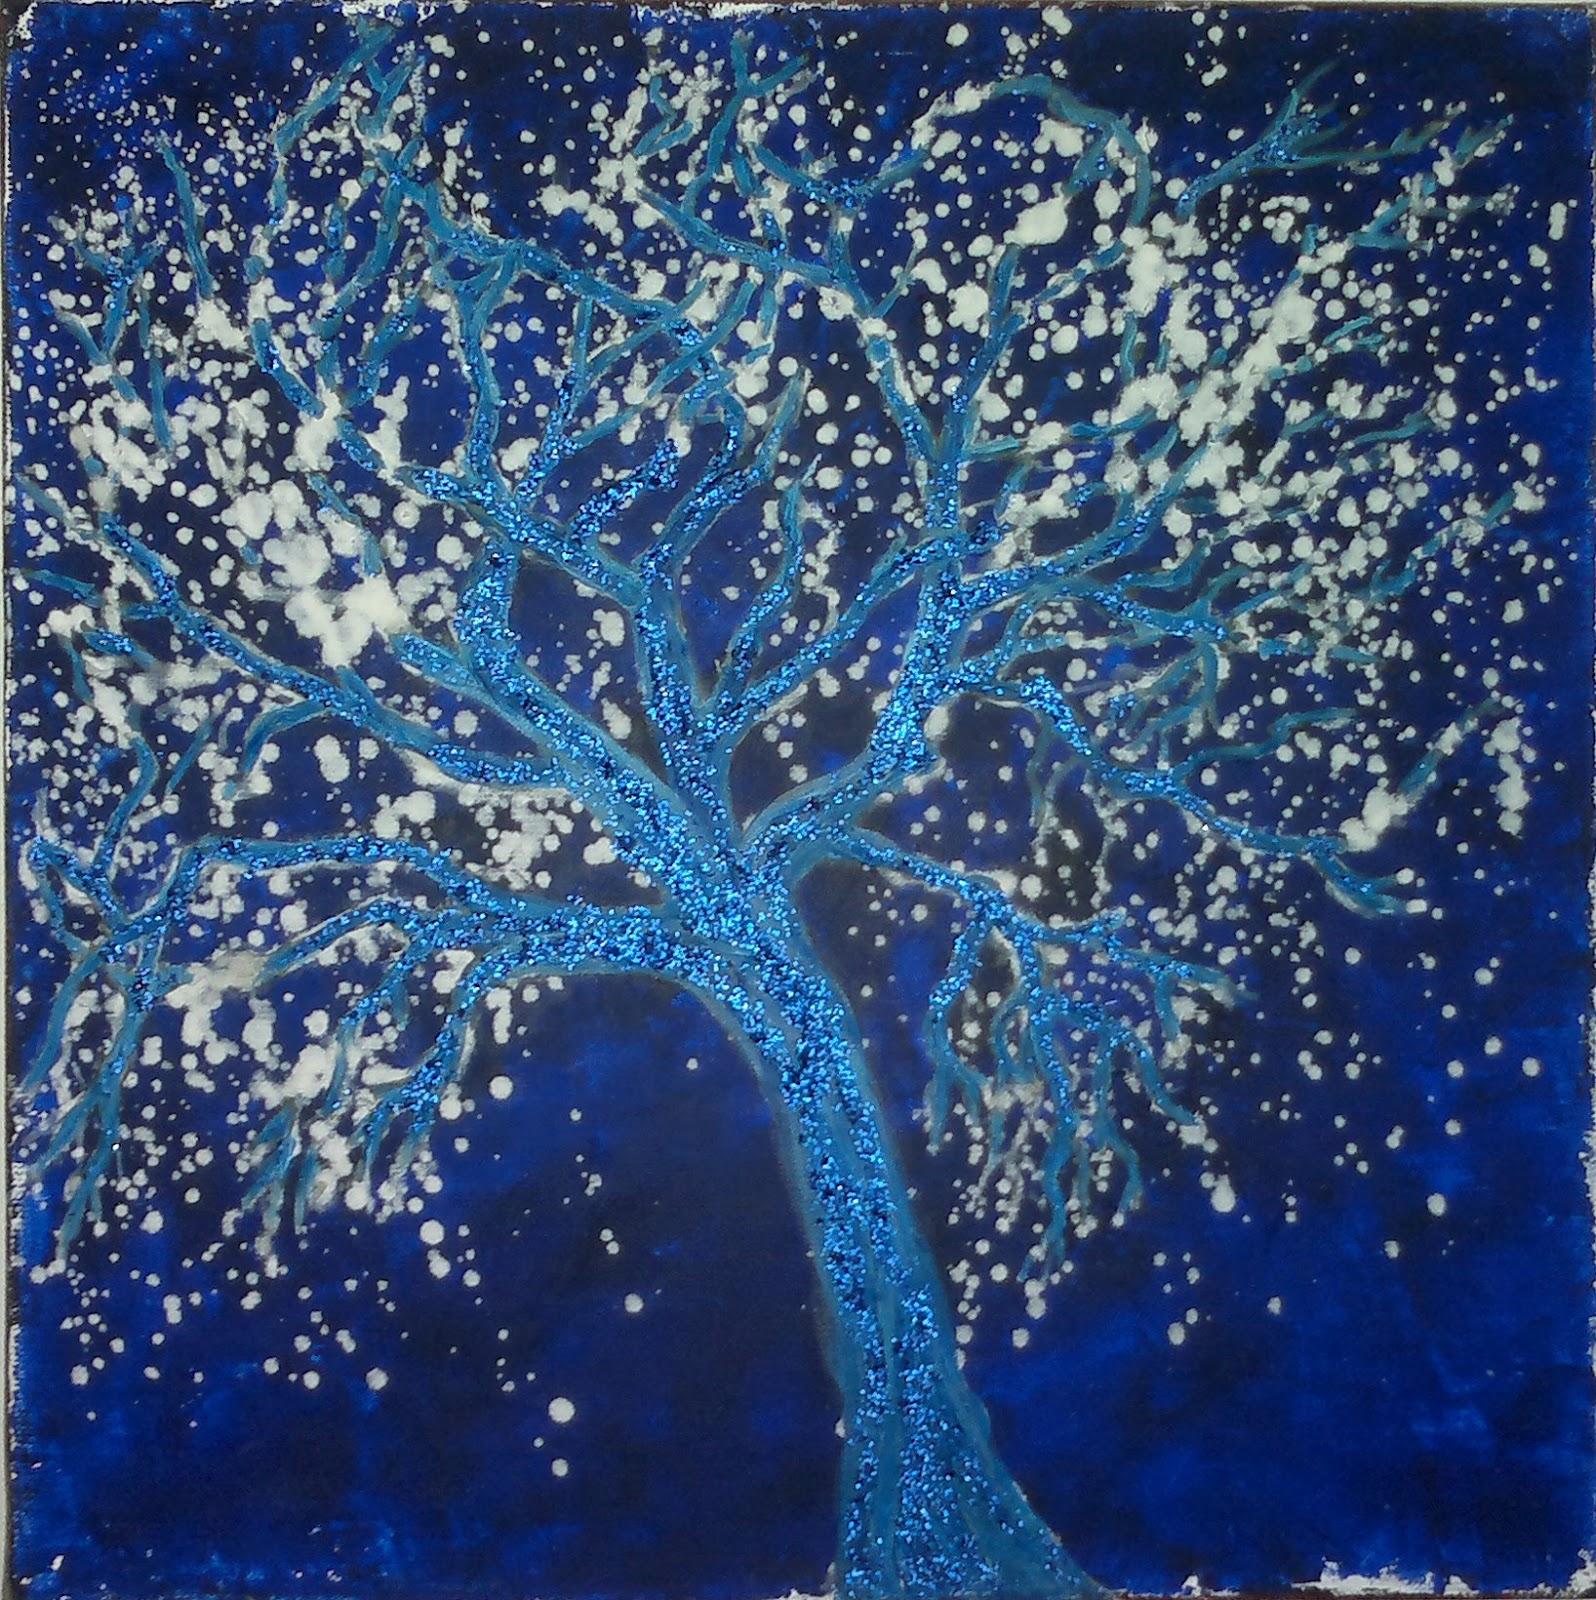 carmilla peinture arbre bleu dans la neige. Black Bedroom Furniture Sets. Home Design Ideas